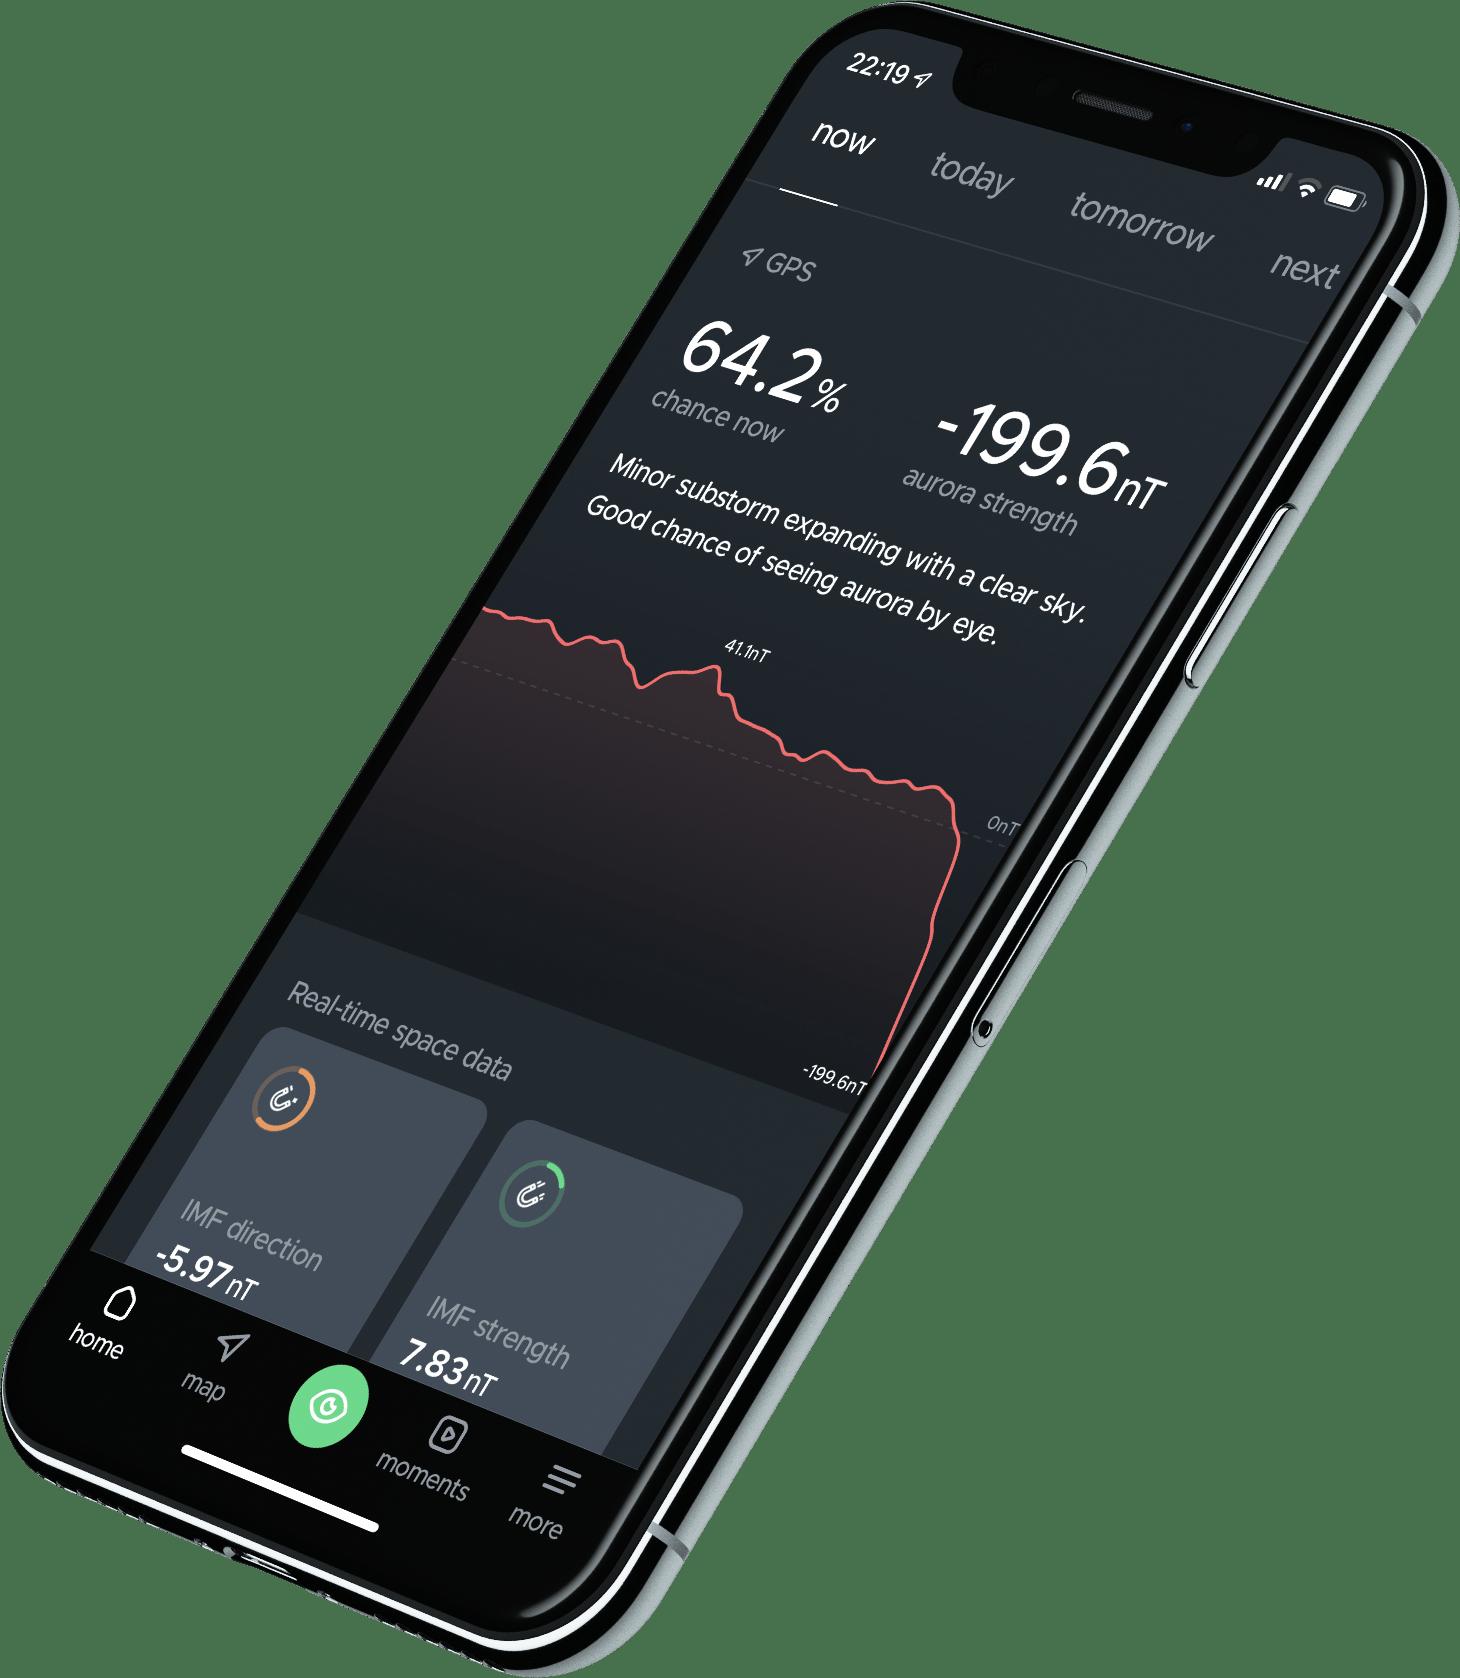 hello aurora interface within an iPhone